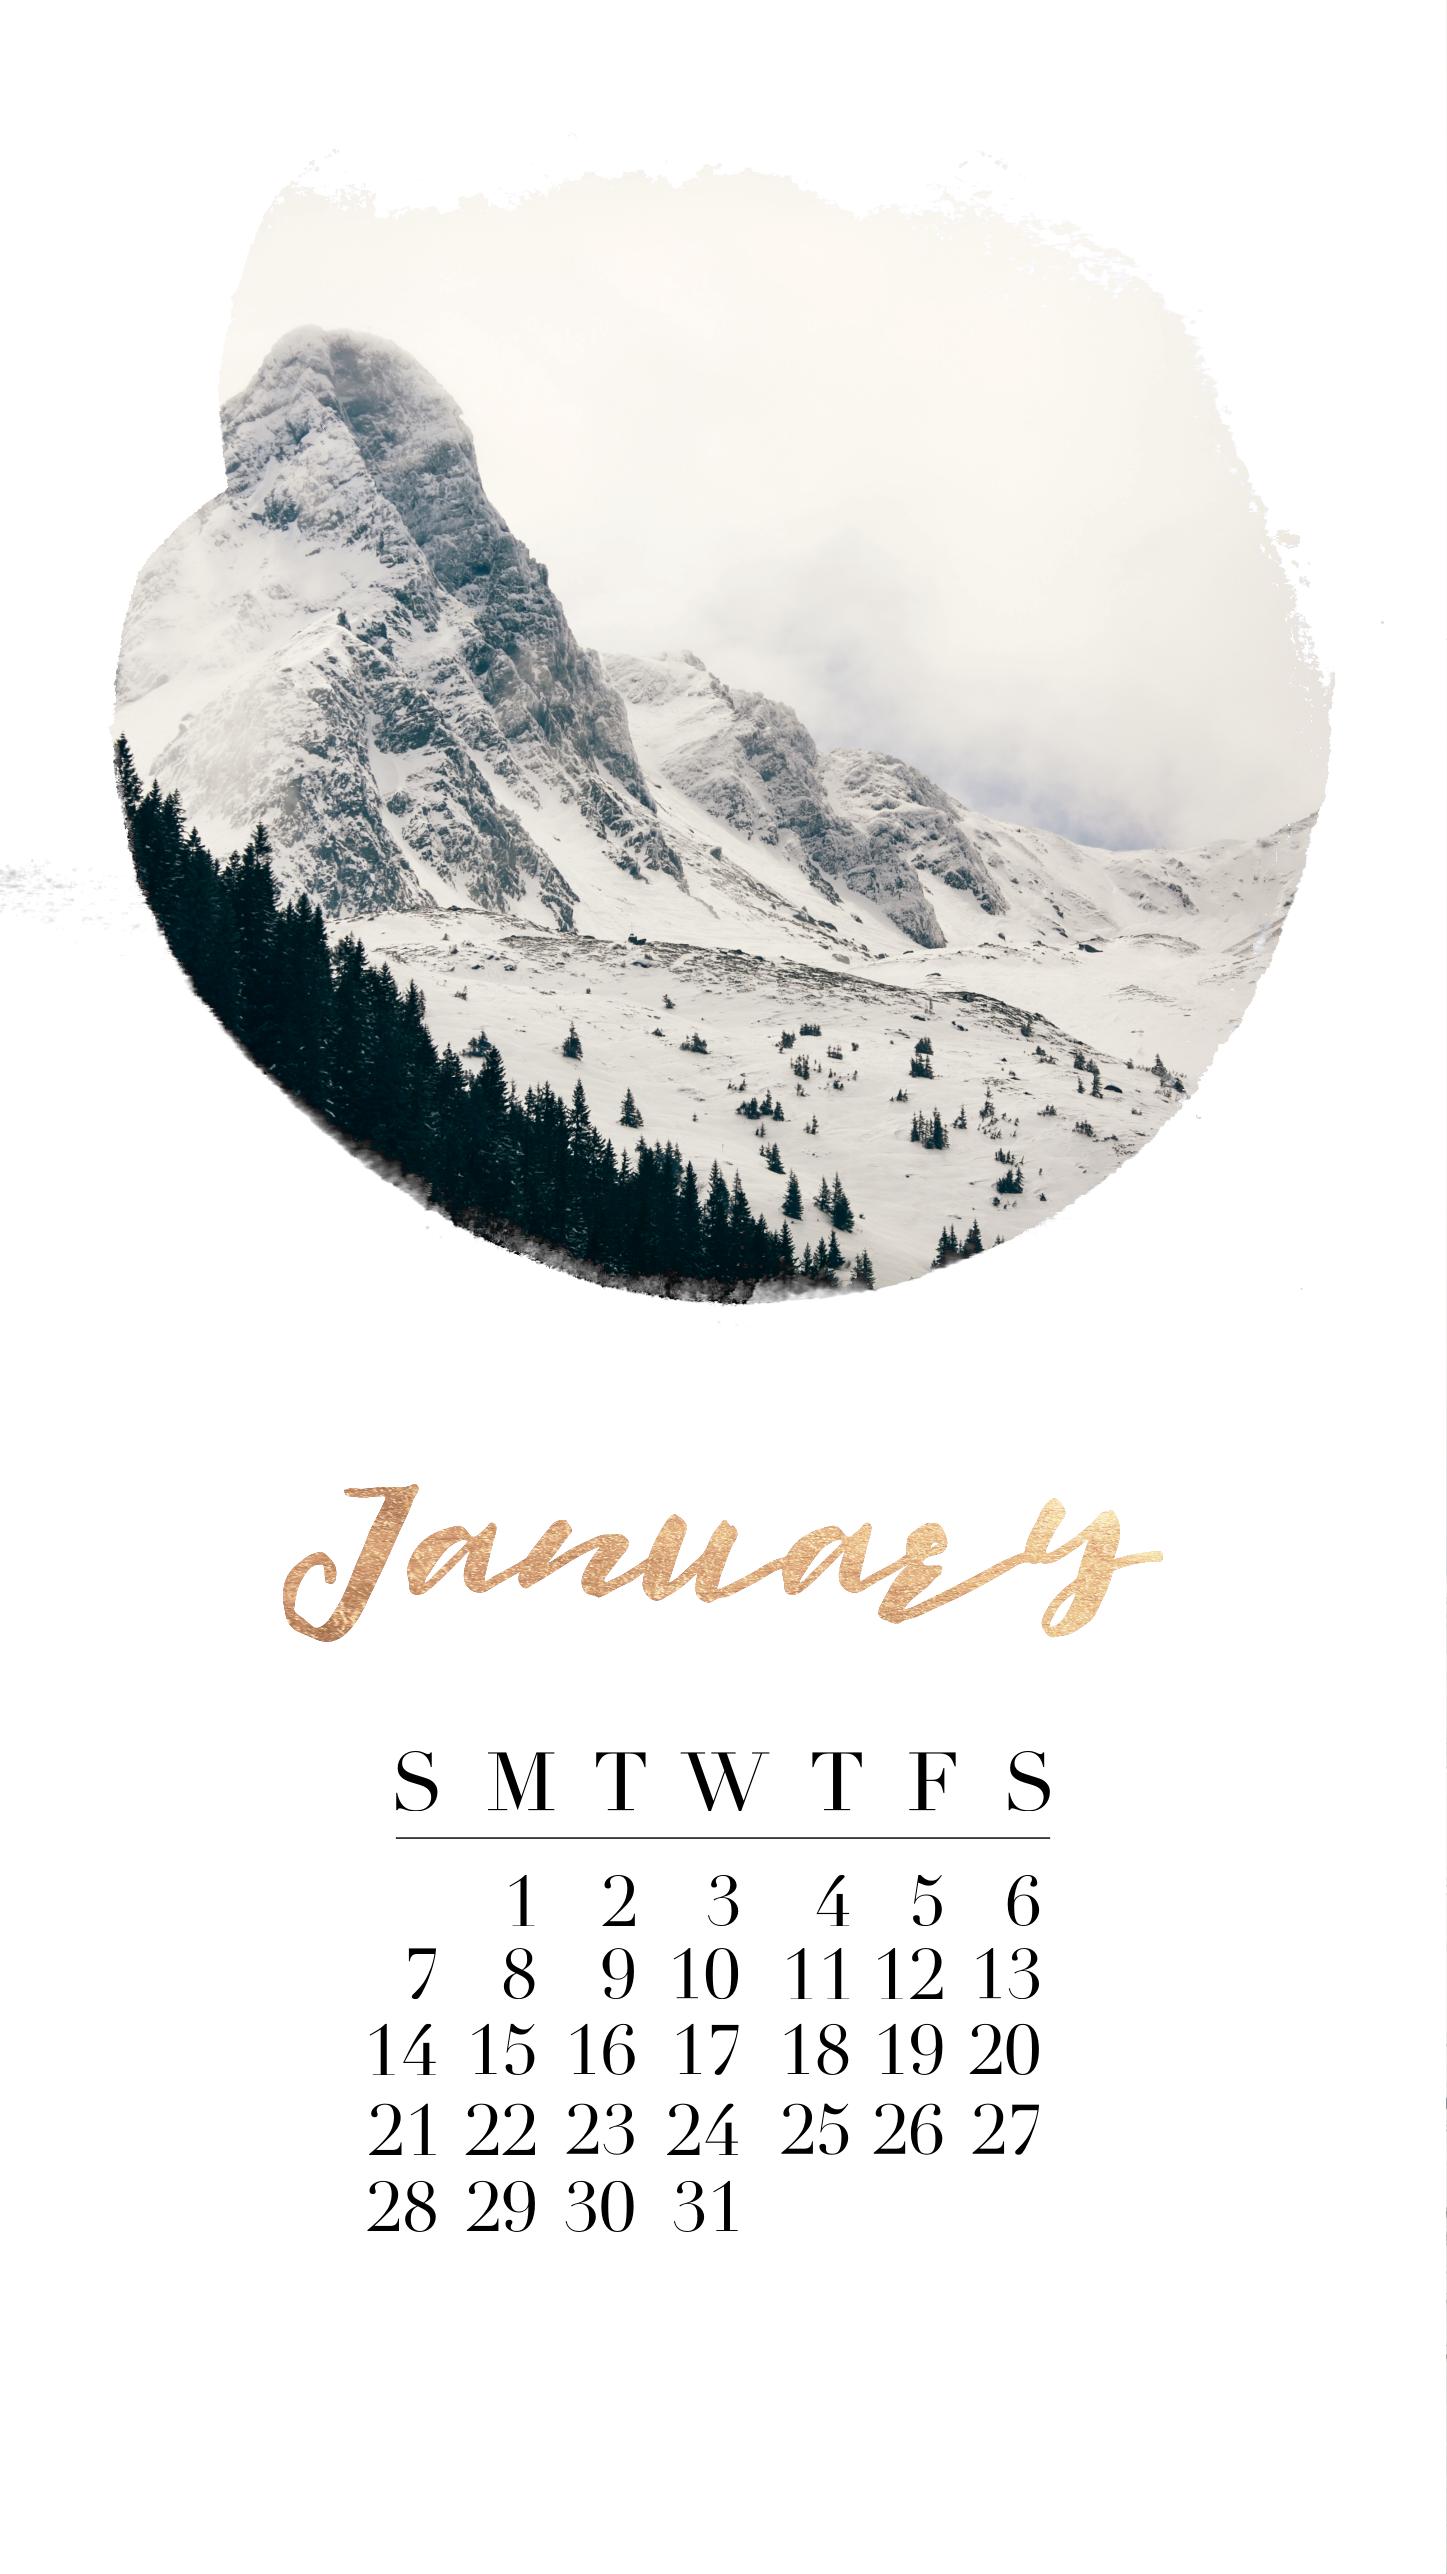 January 2018 Calendar Iphone Background Gold Winter Mountains Calendar Wallpaper Calendar Background January Wallpaper